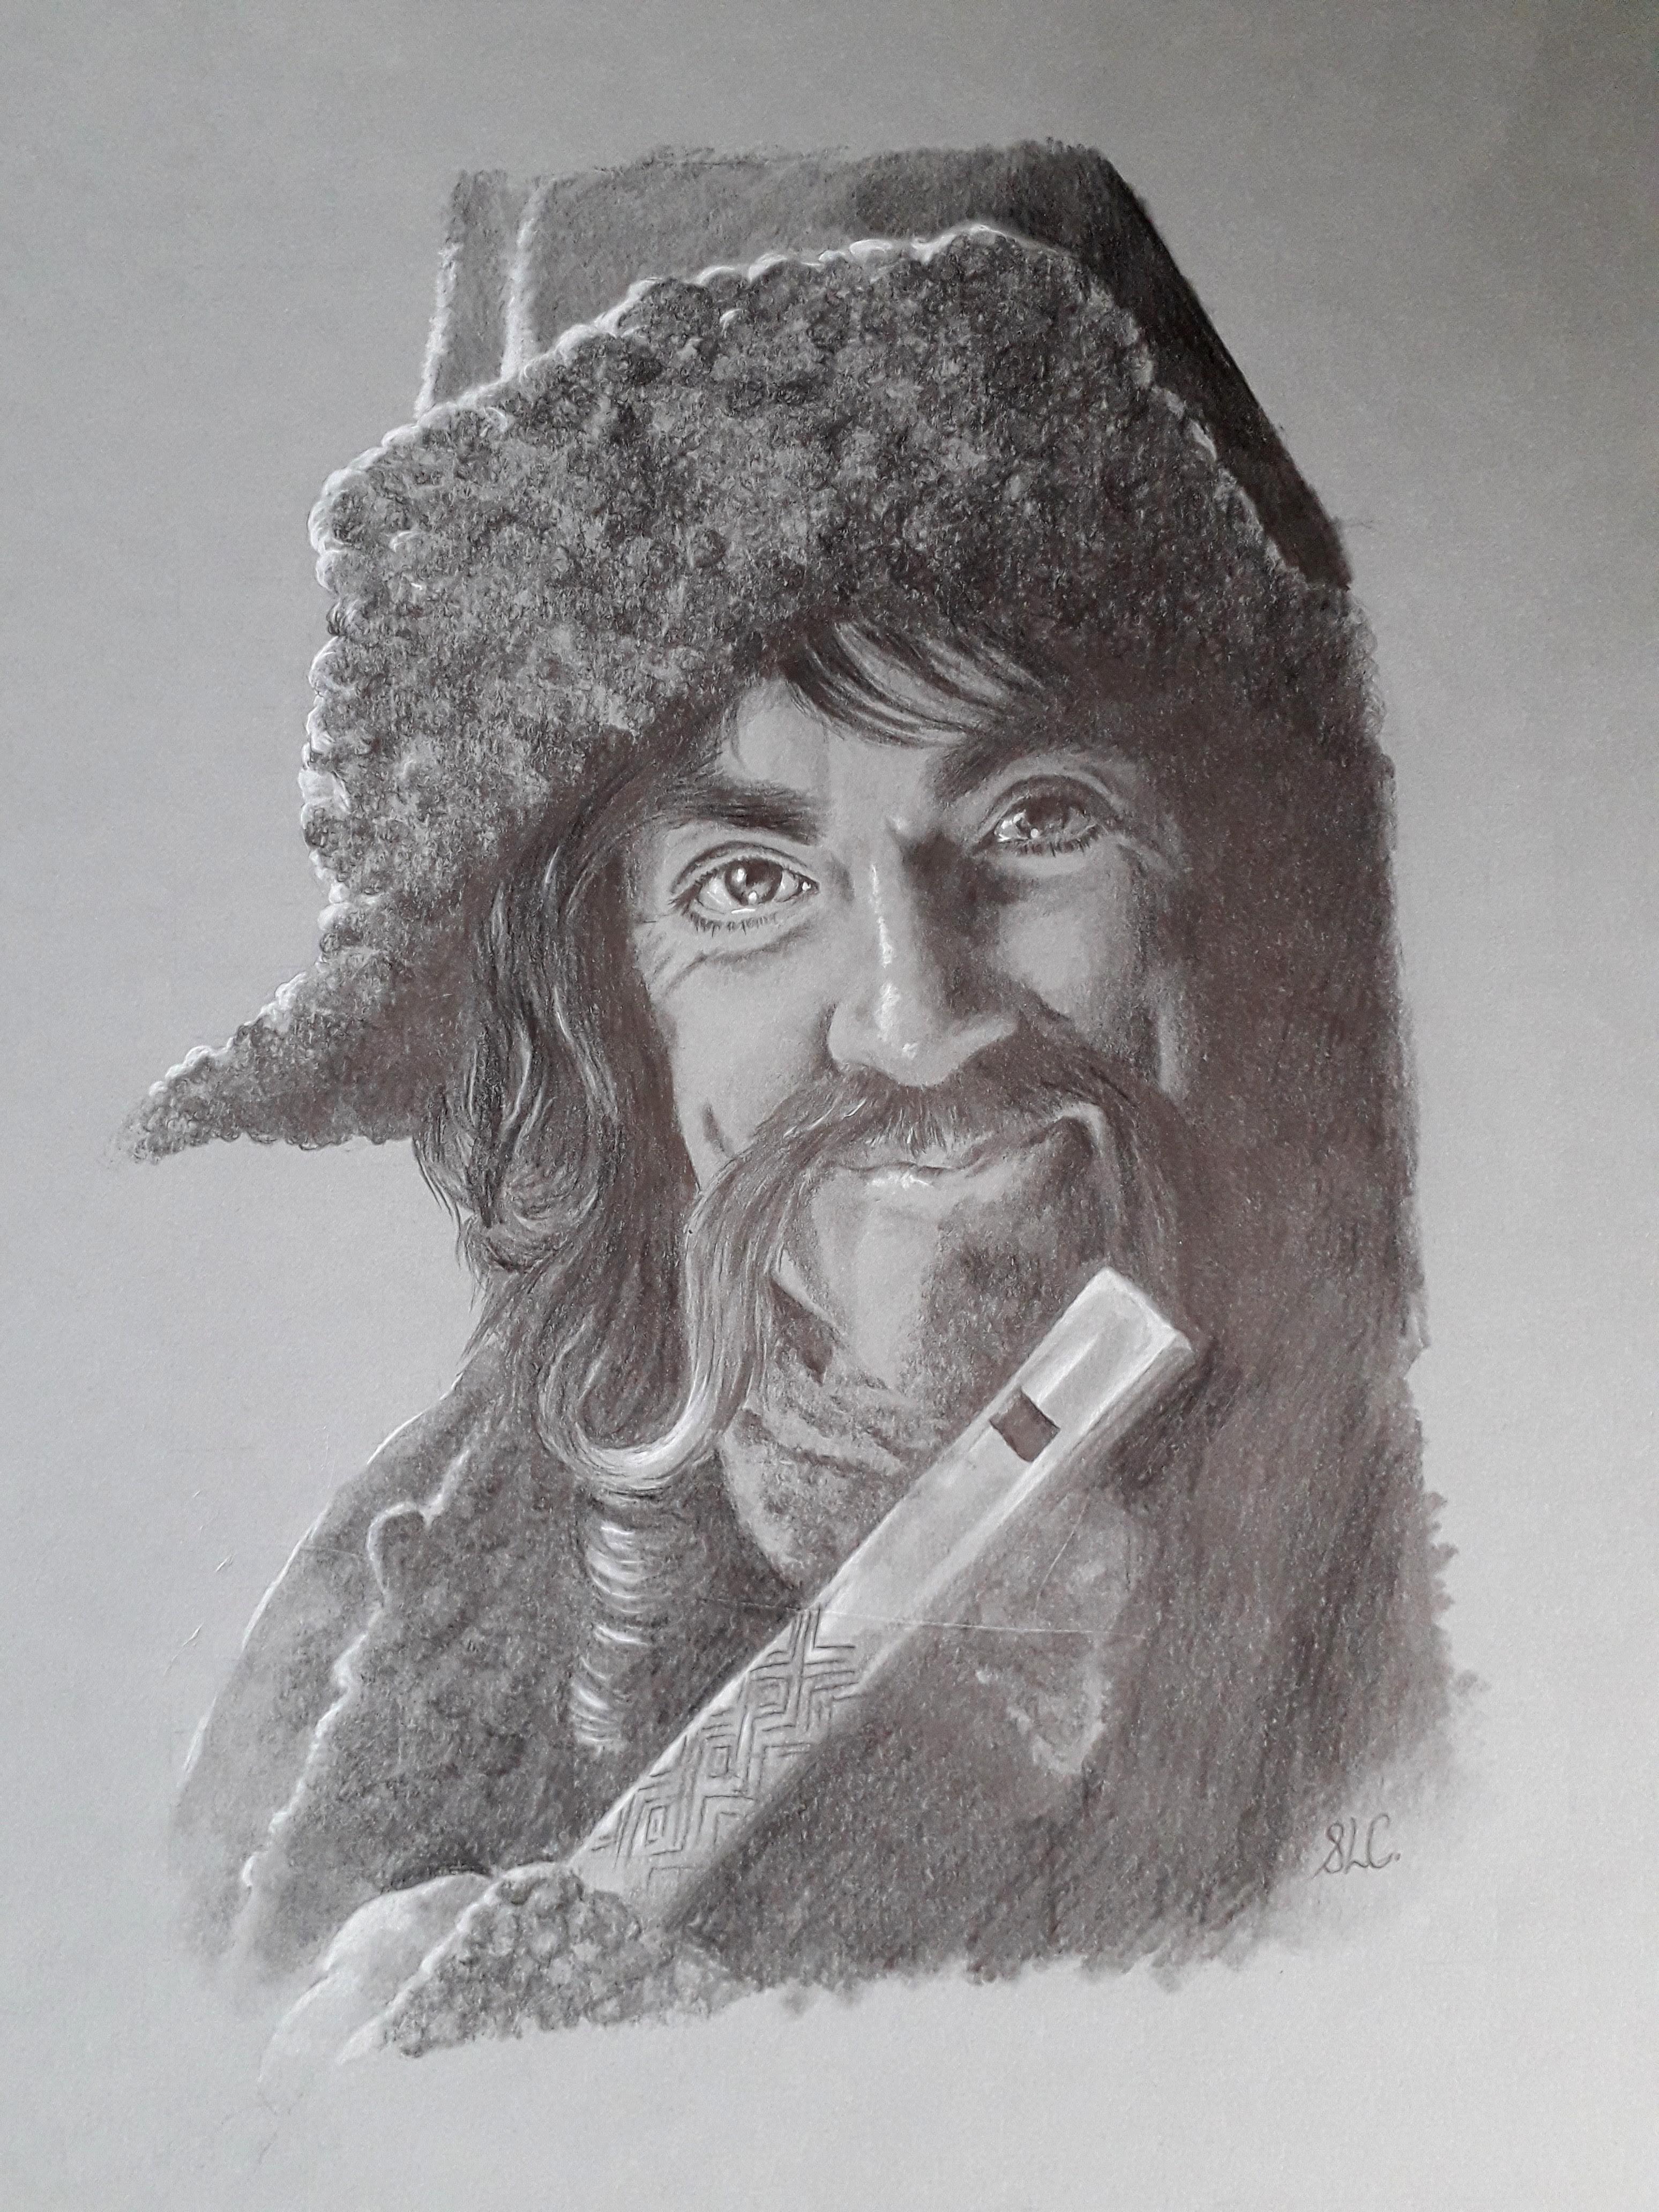 James Nesbitt as Bofur